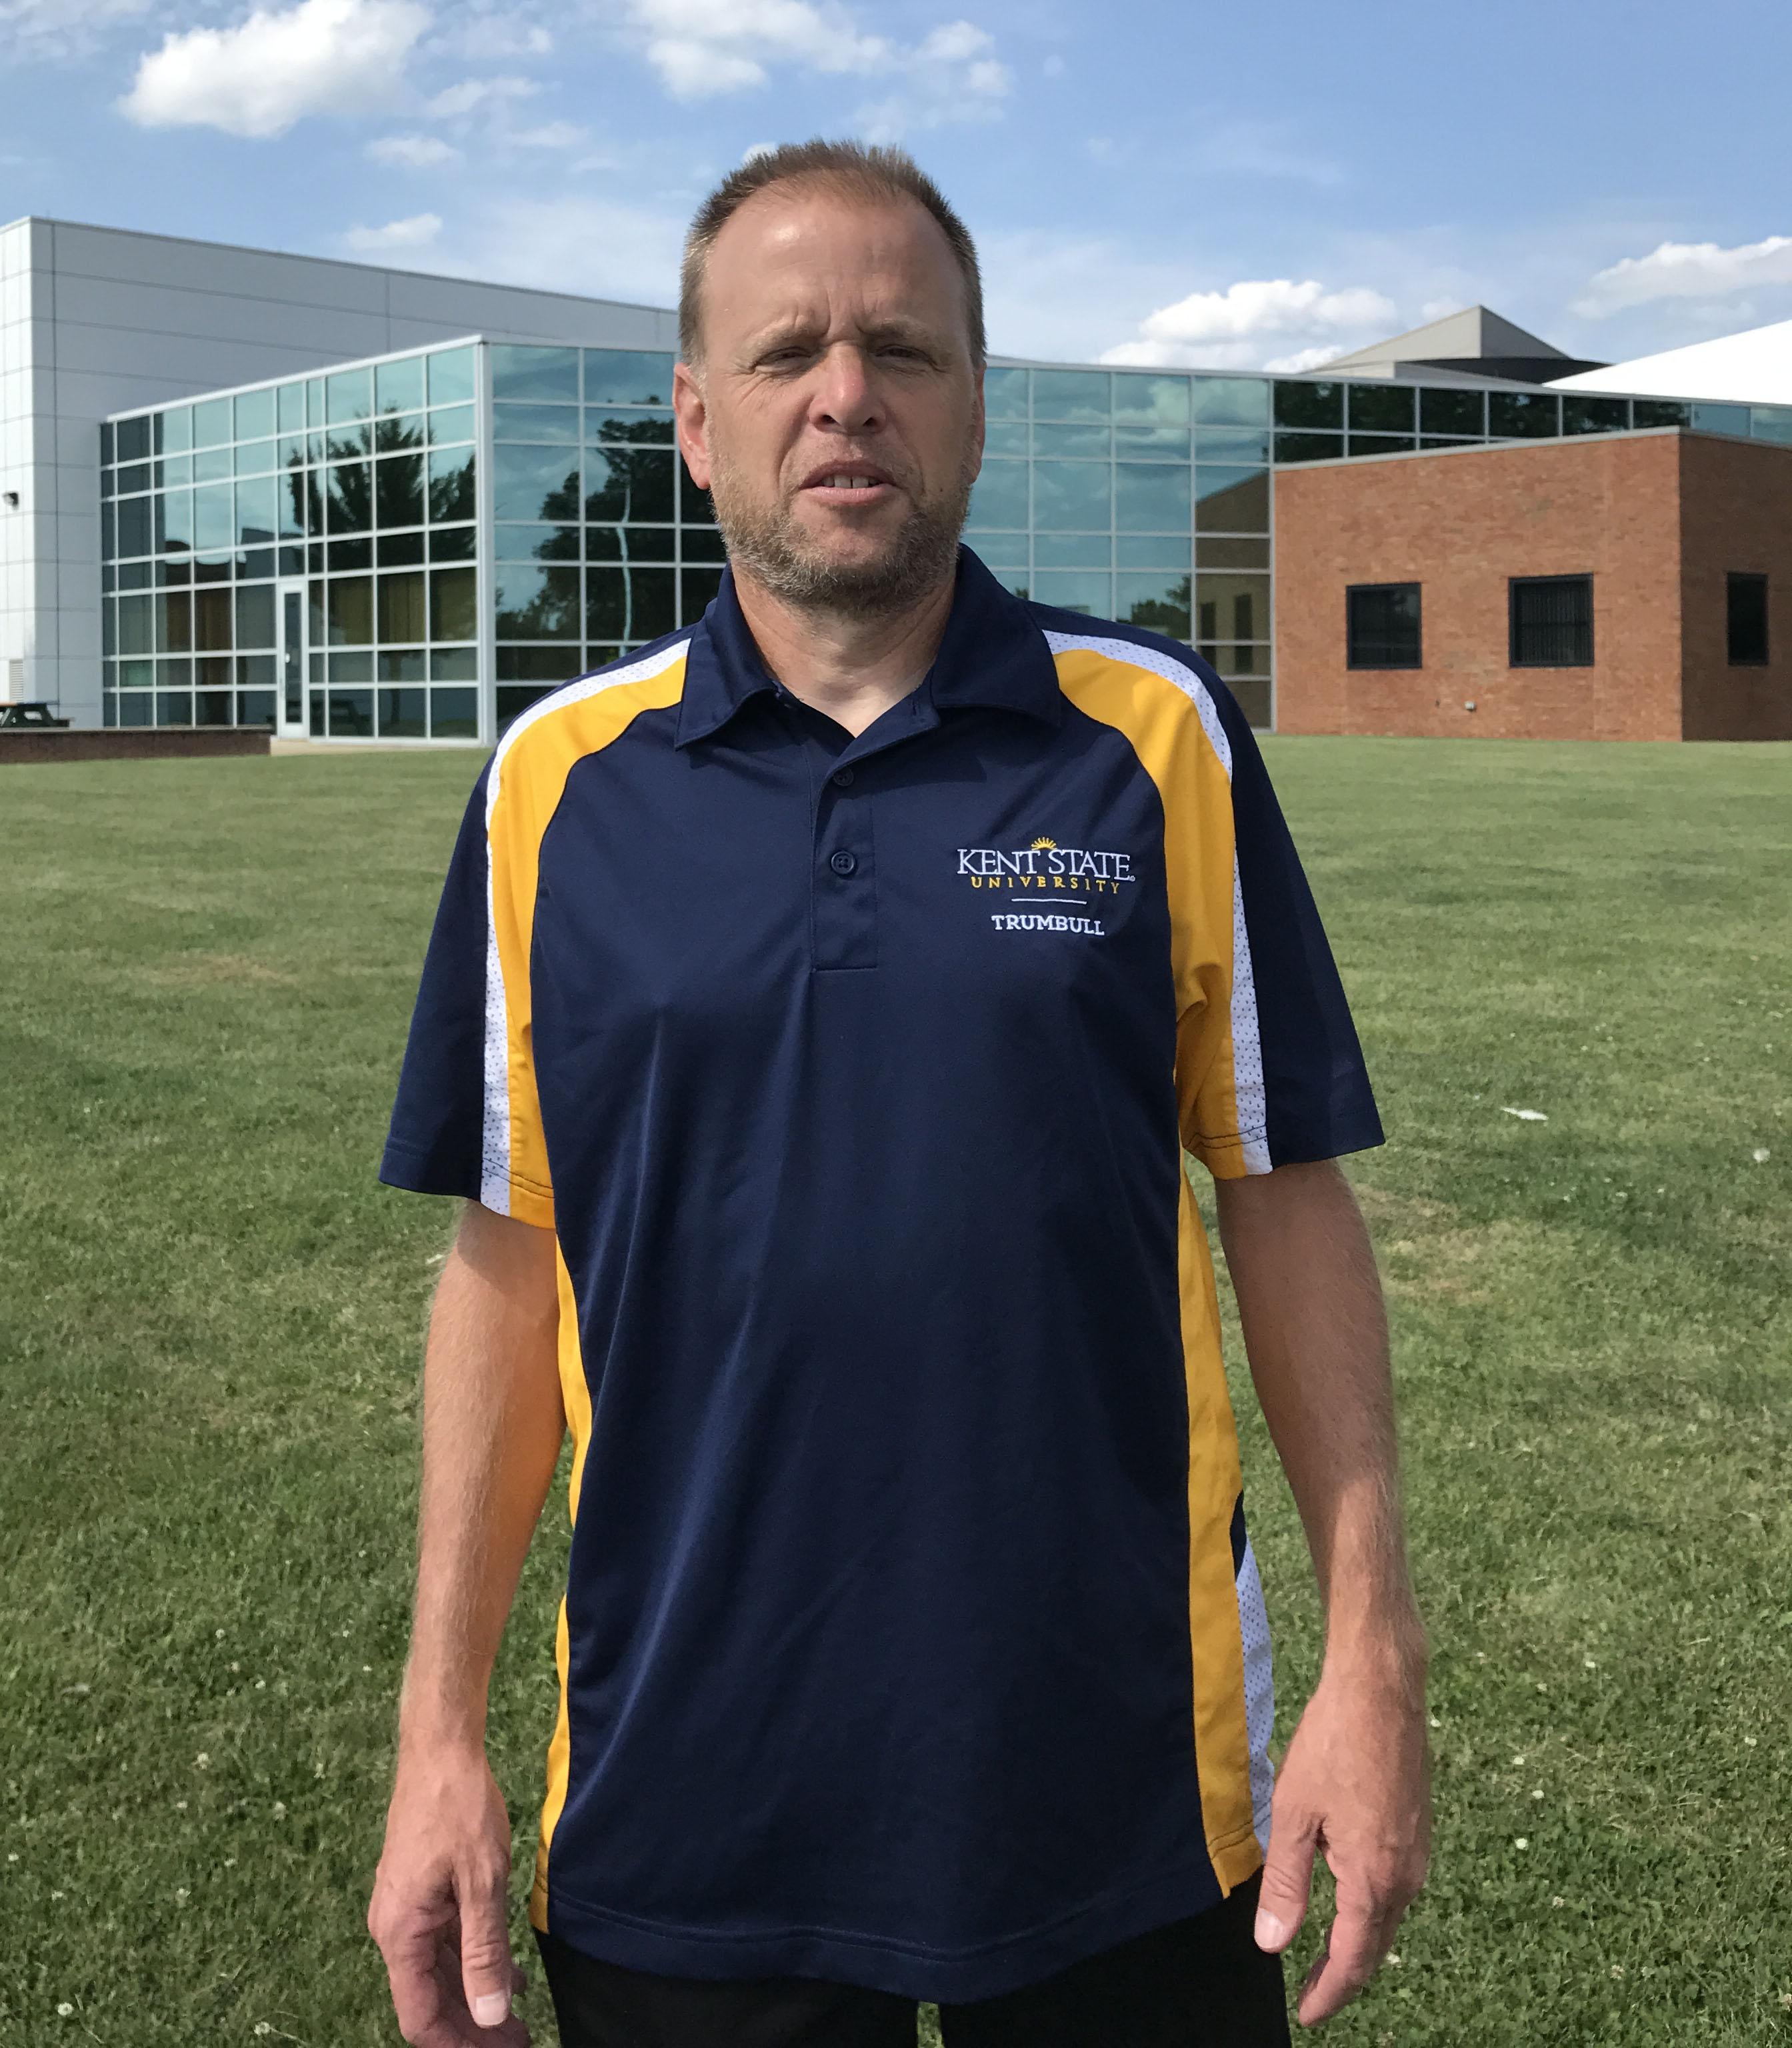 Bill Hess Cross Country Coach